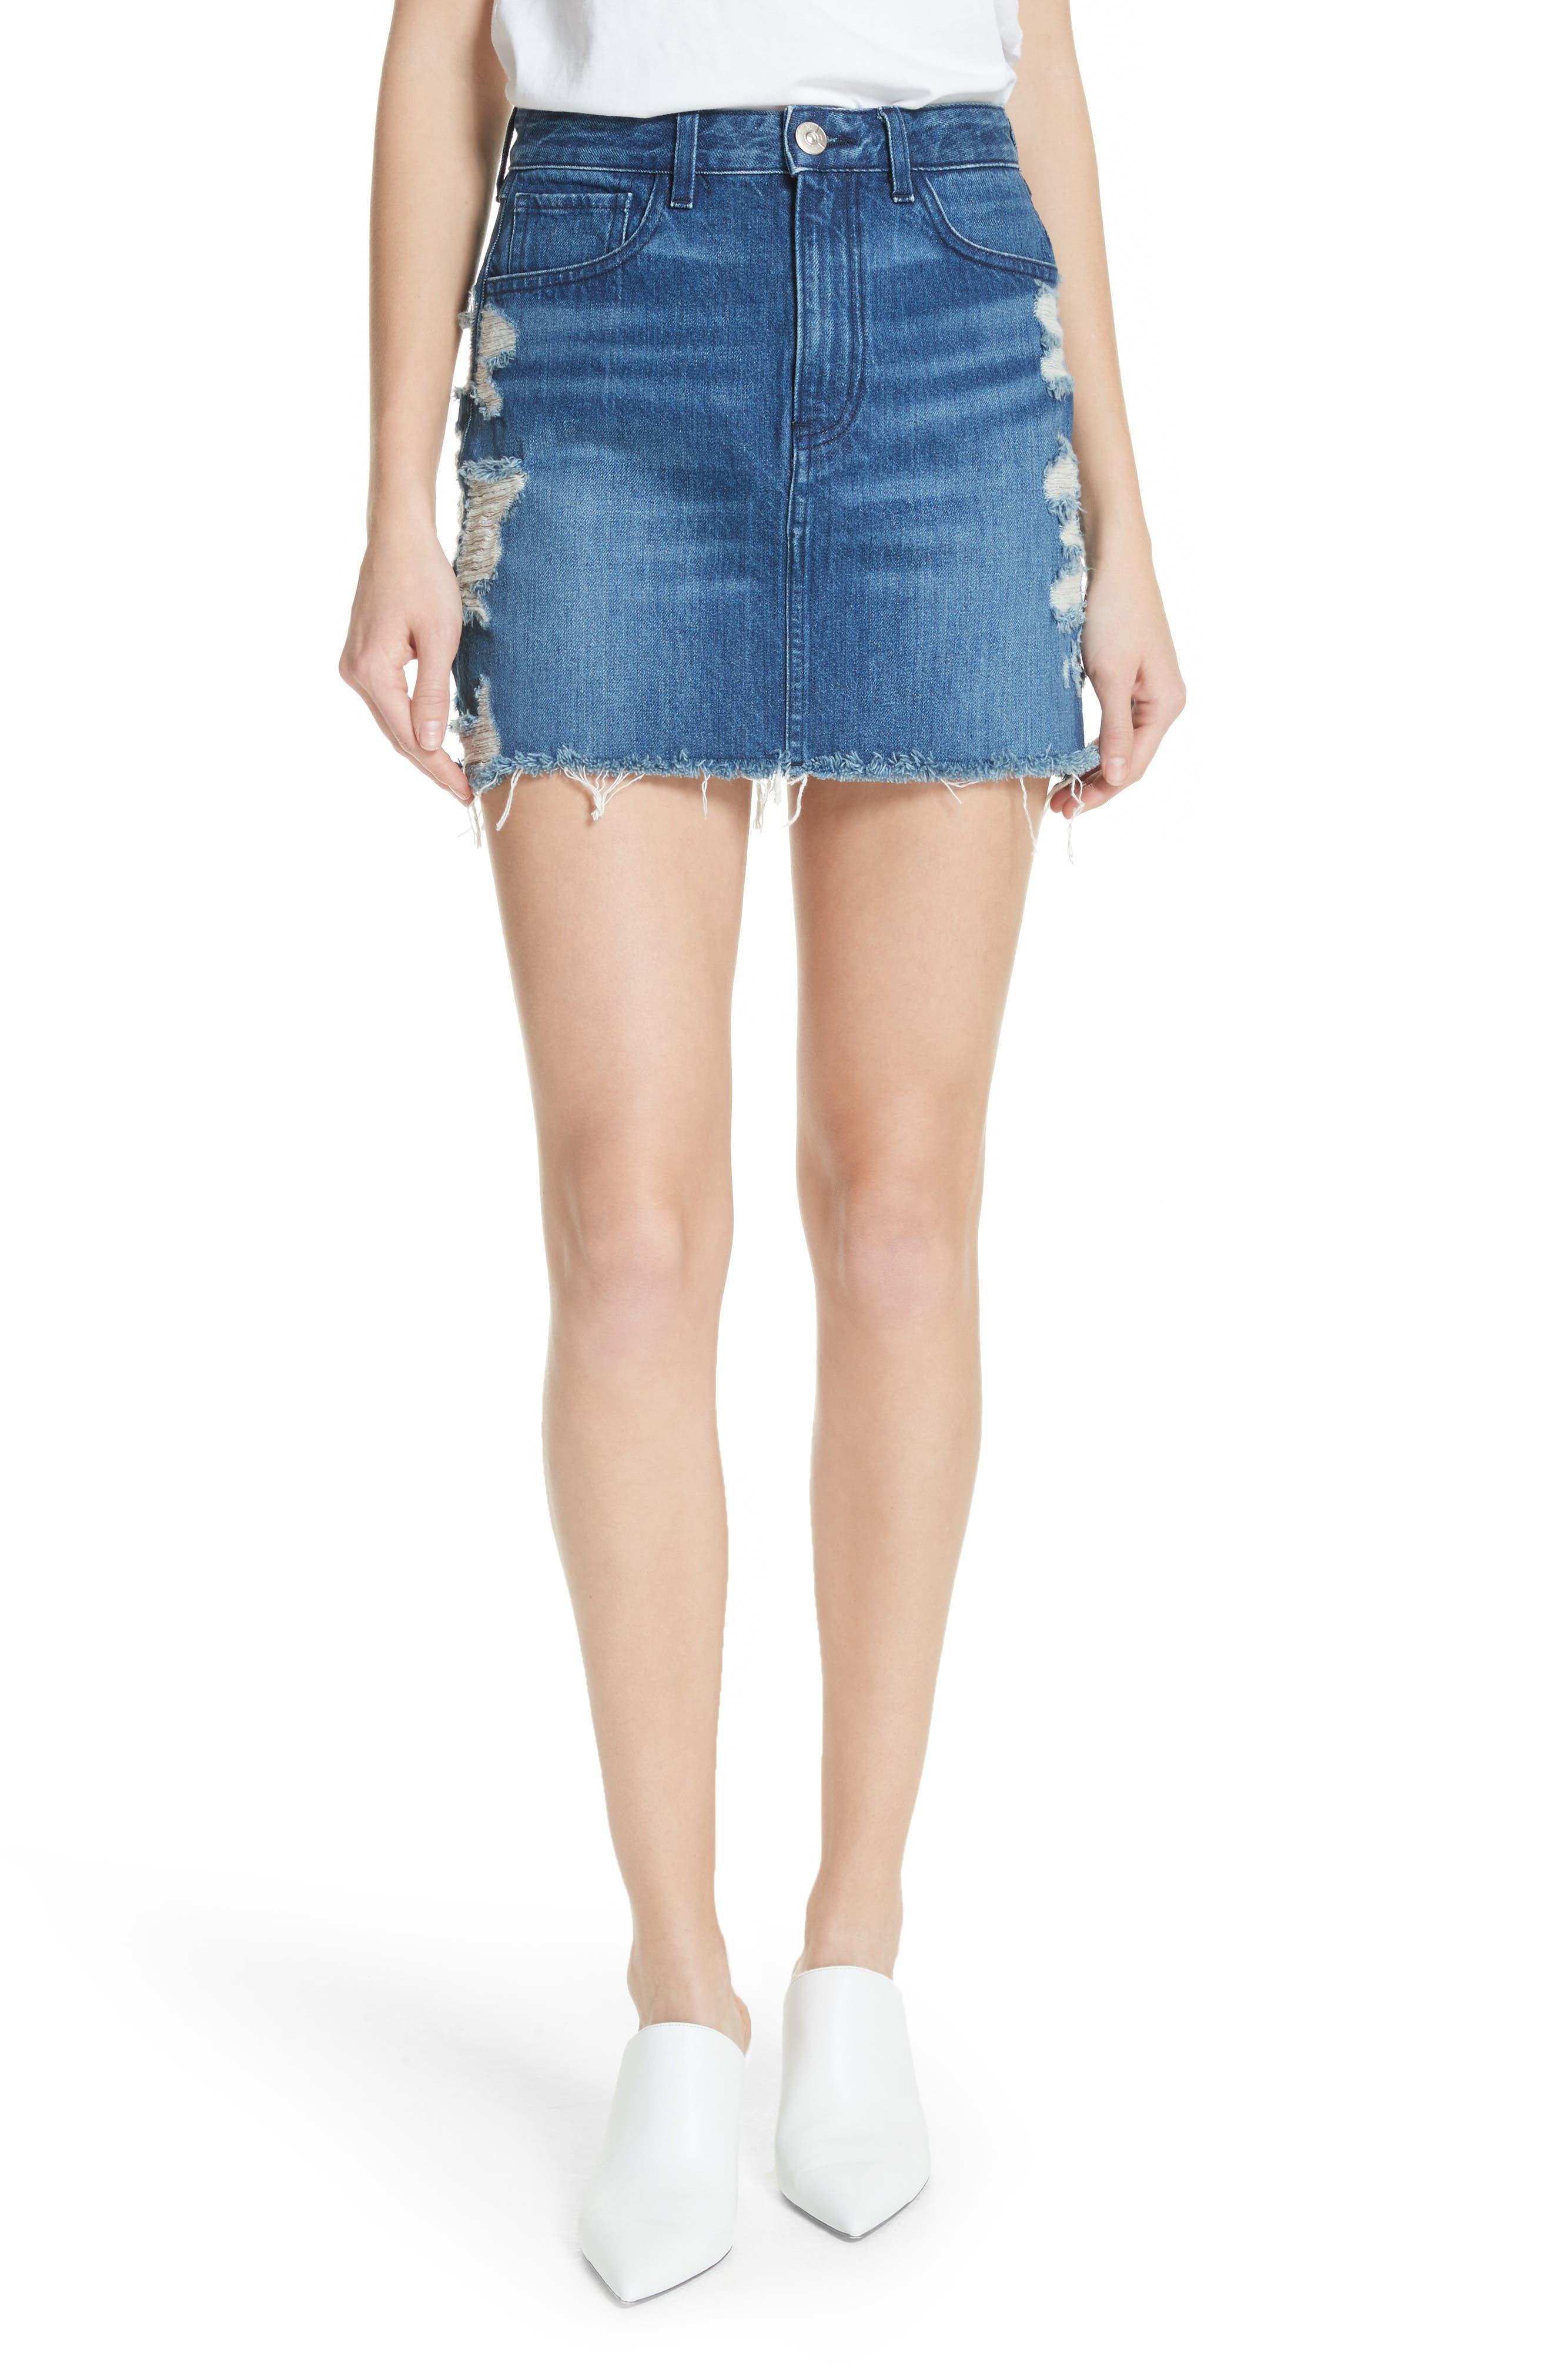 3x1 NYC Celine Distressed Denim Skirt